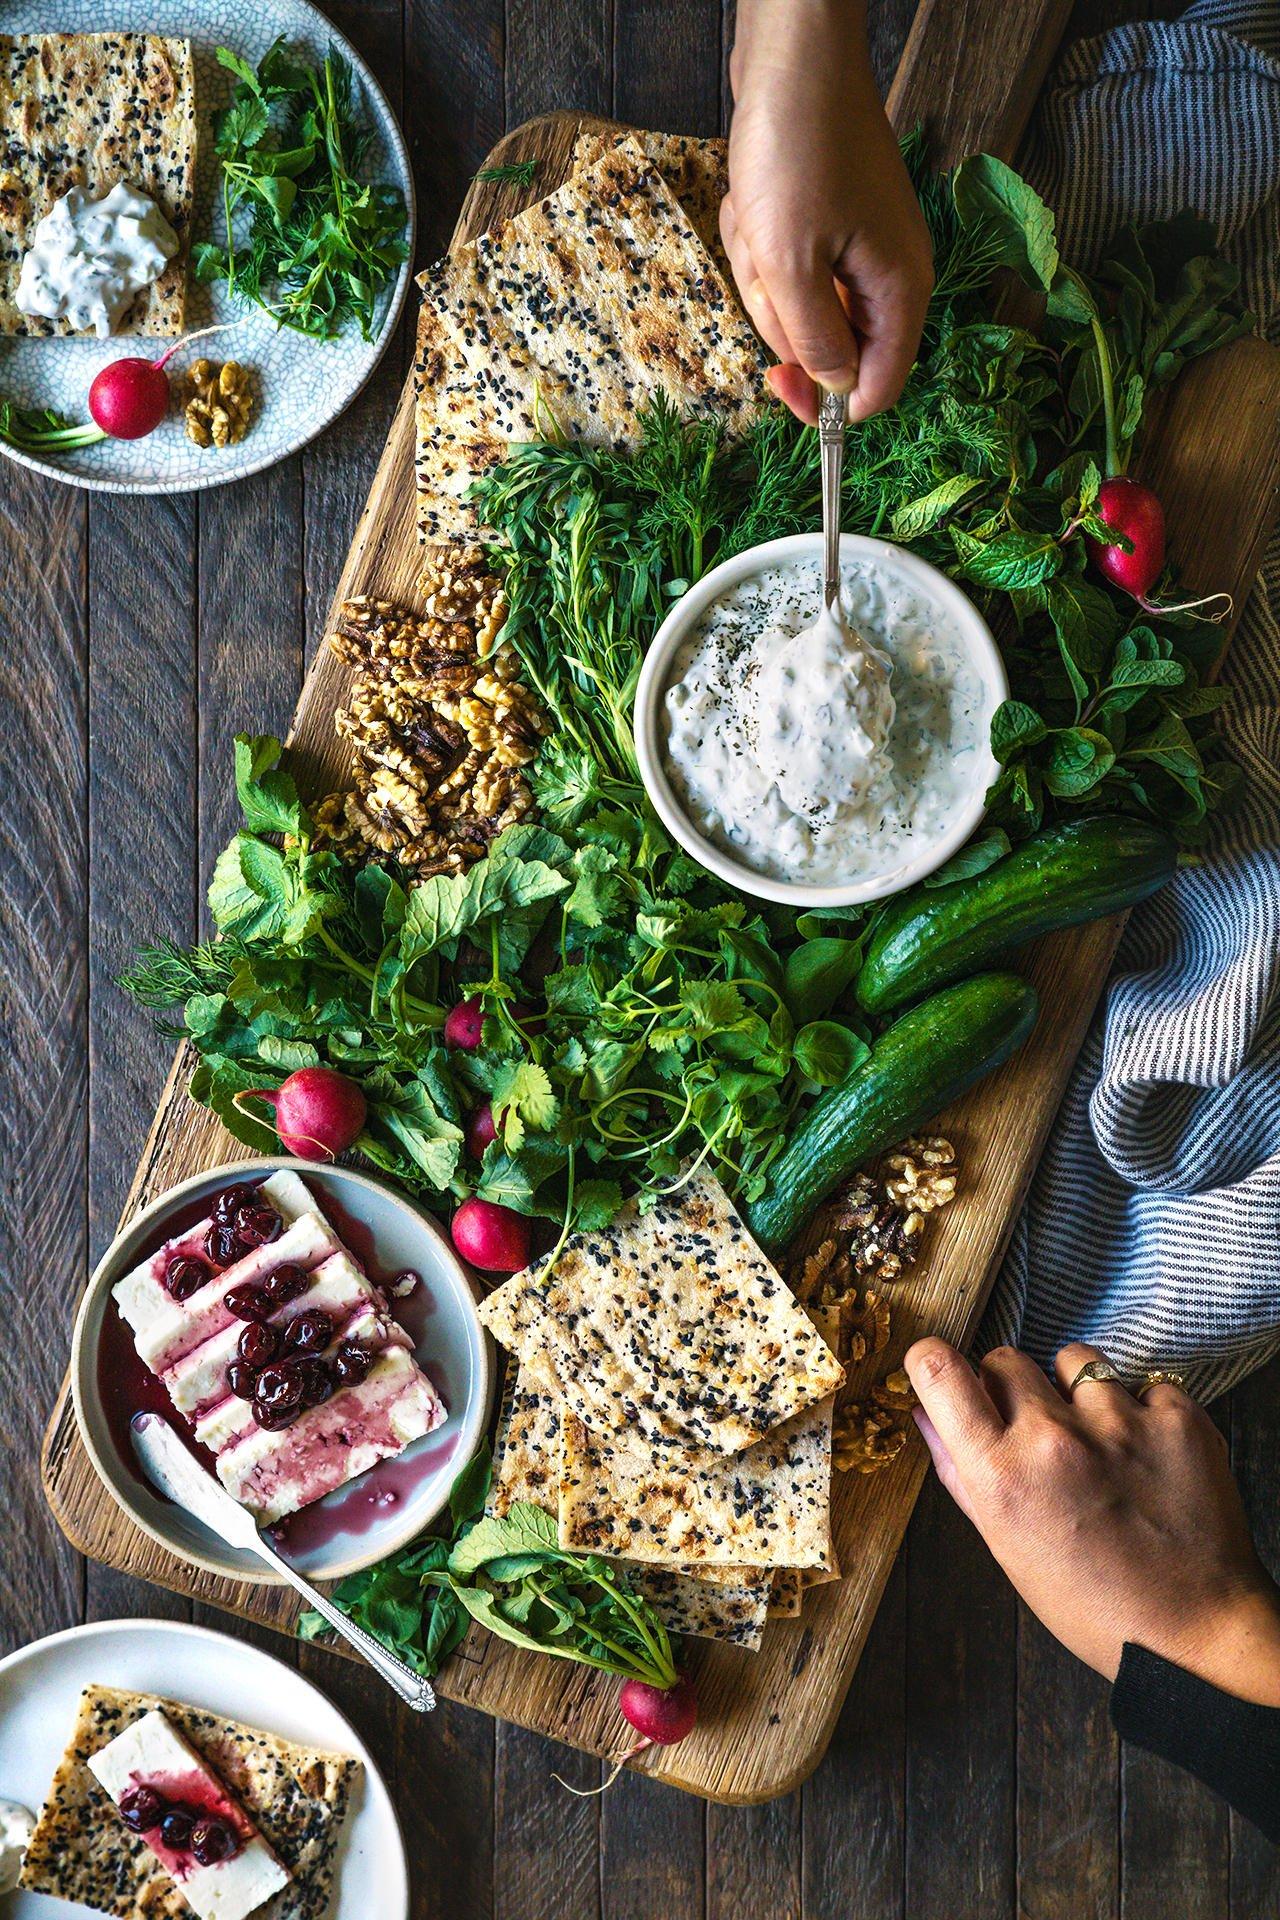 Persian Cheese and Herb Platter | HonestlyYUM (honestlyyum.com)